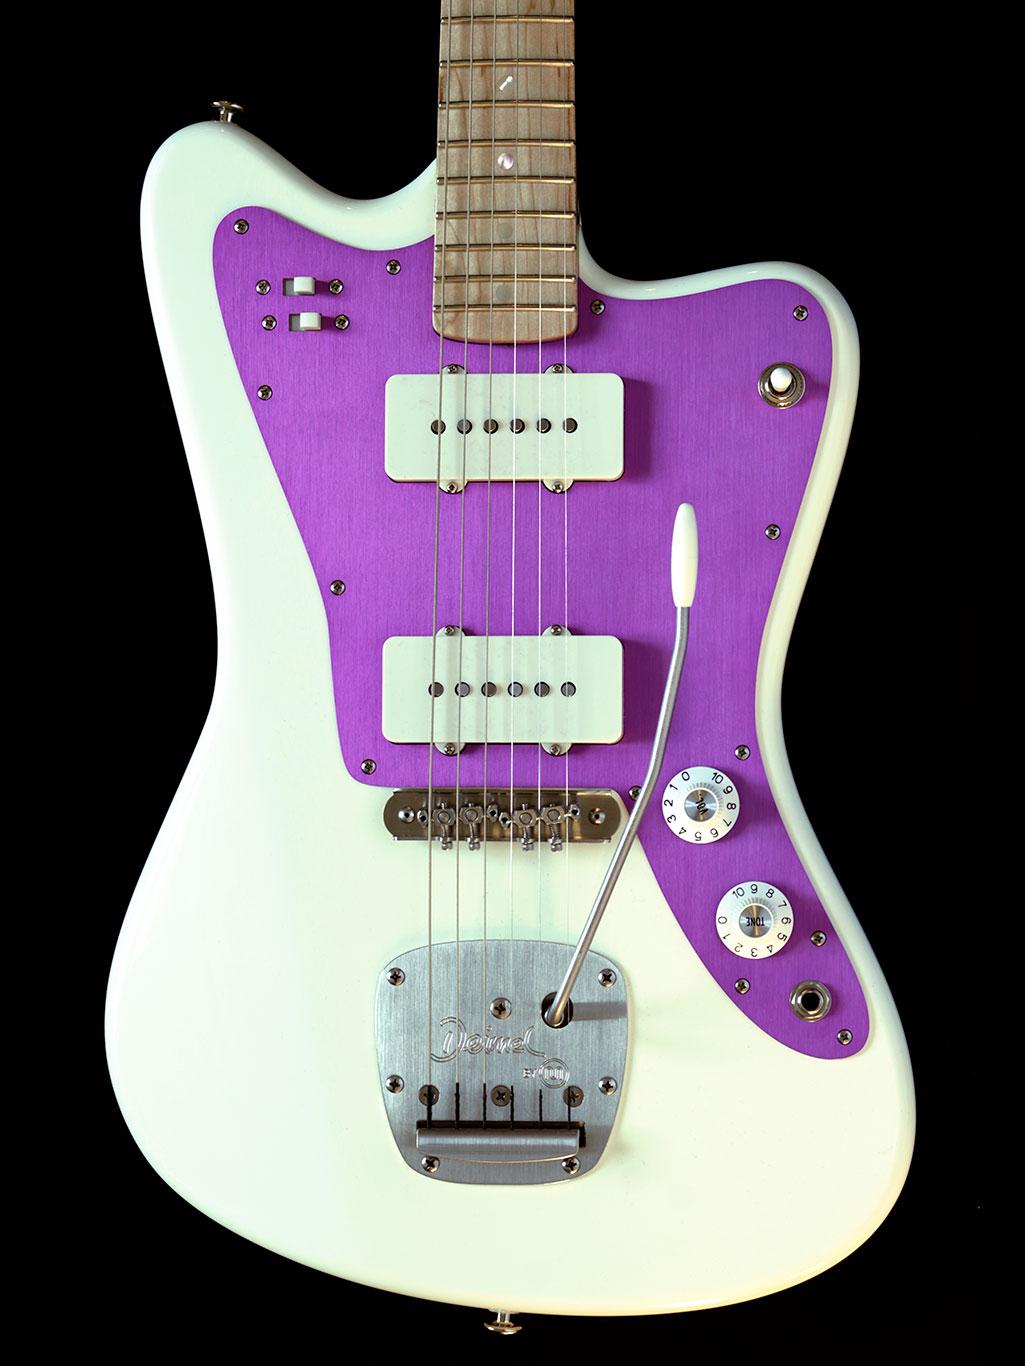 Deimel Firestar »Vintage White« w/ Lollar pickups – Deimel Guitarworks